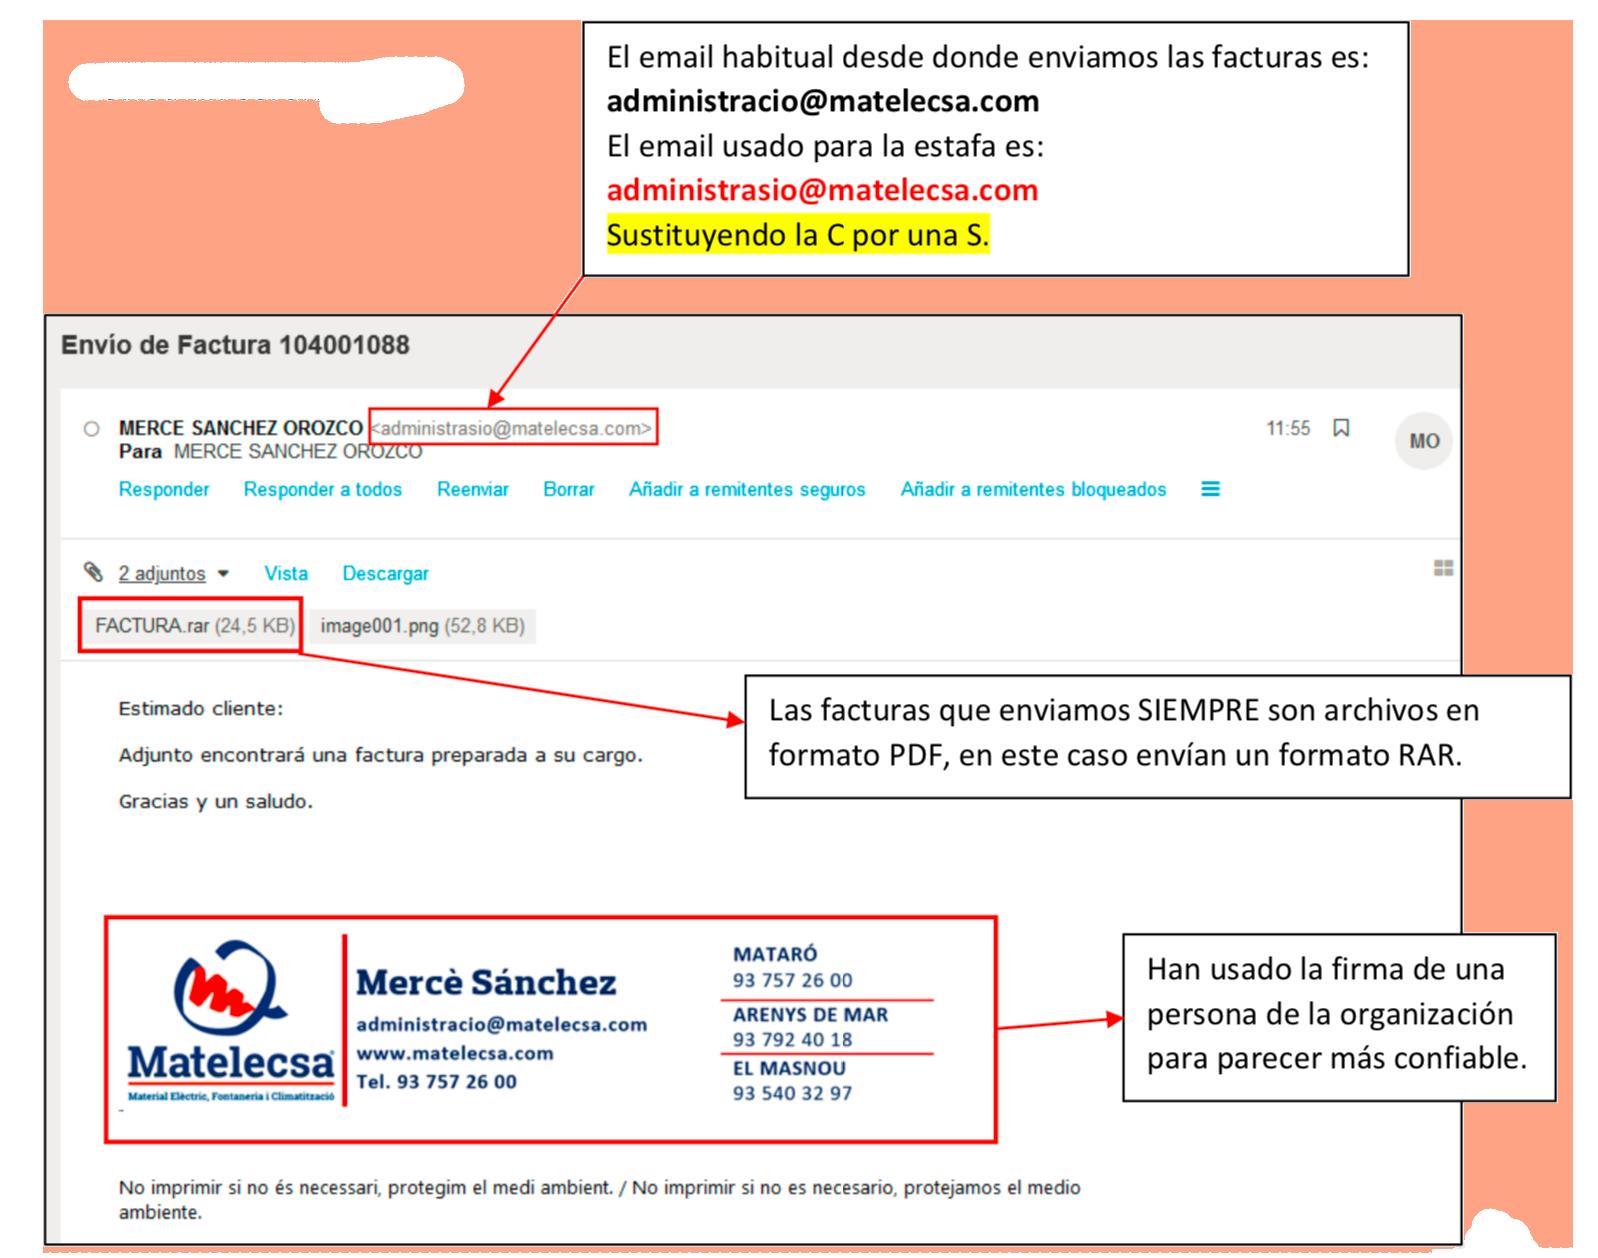 aviso-matelecsa-email